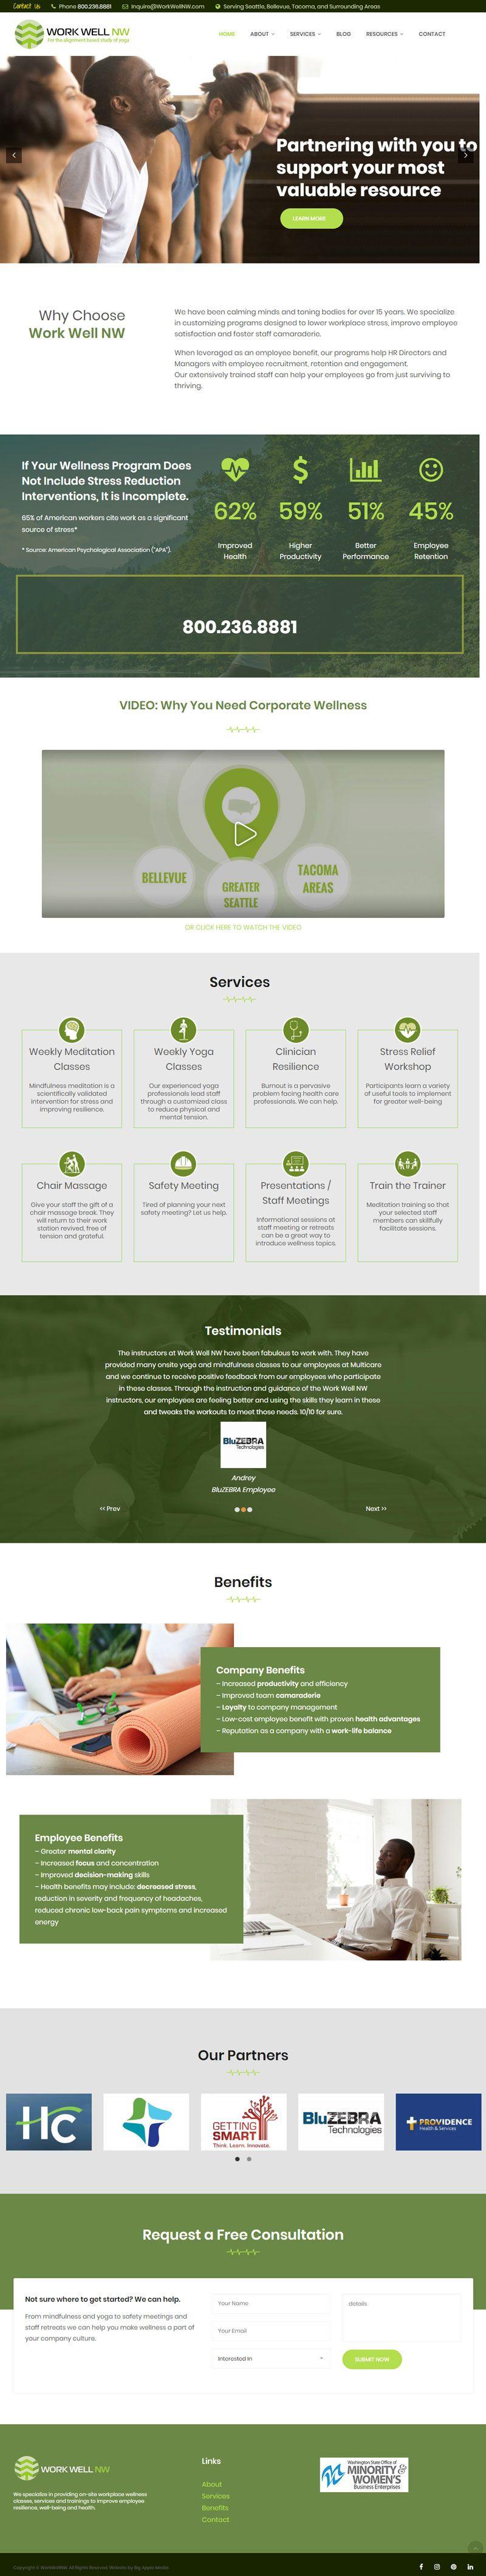 corporate wellness website redesign